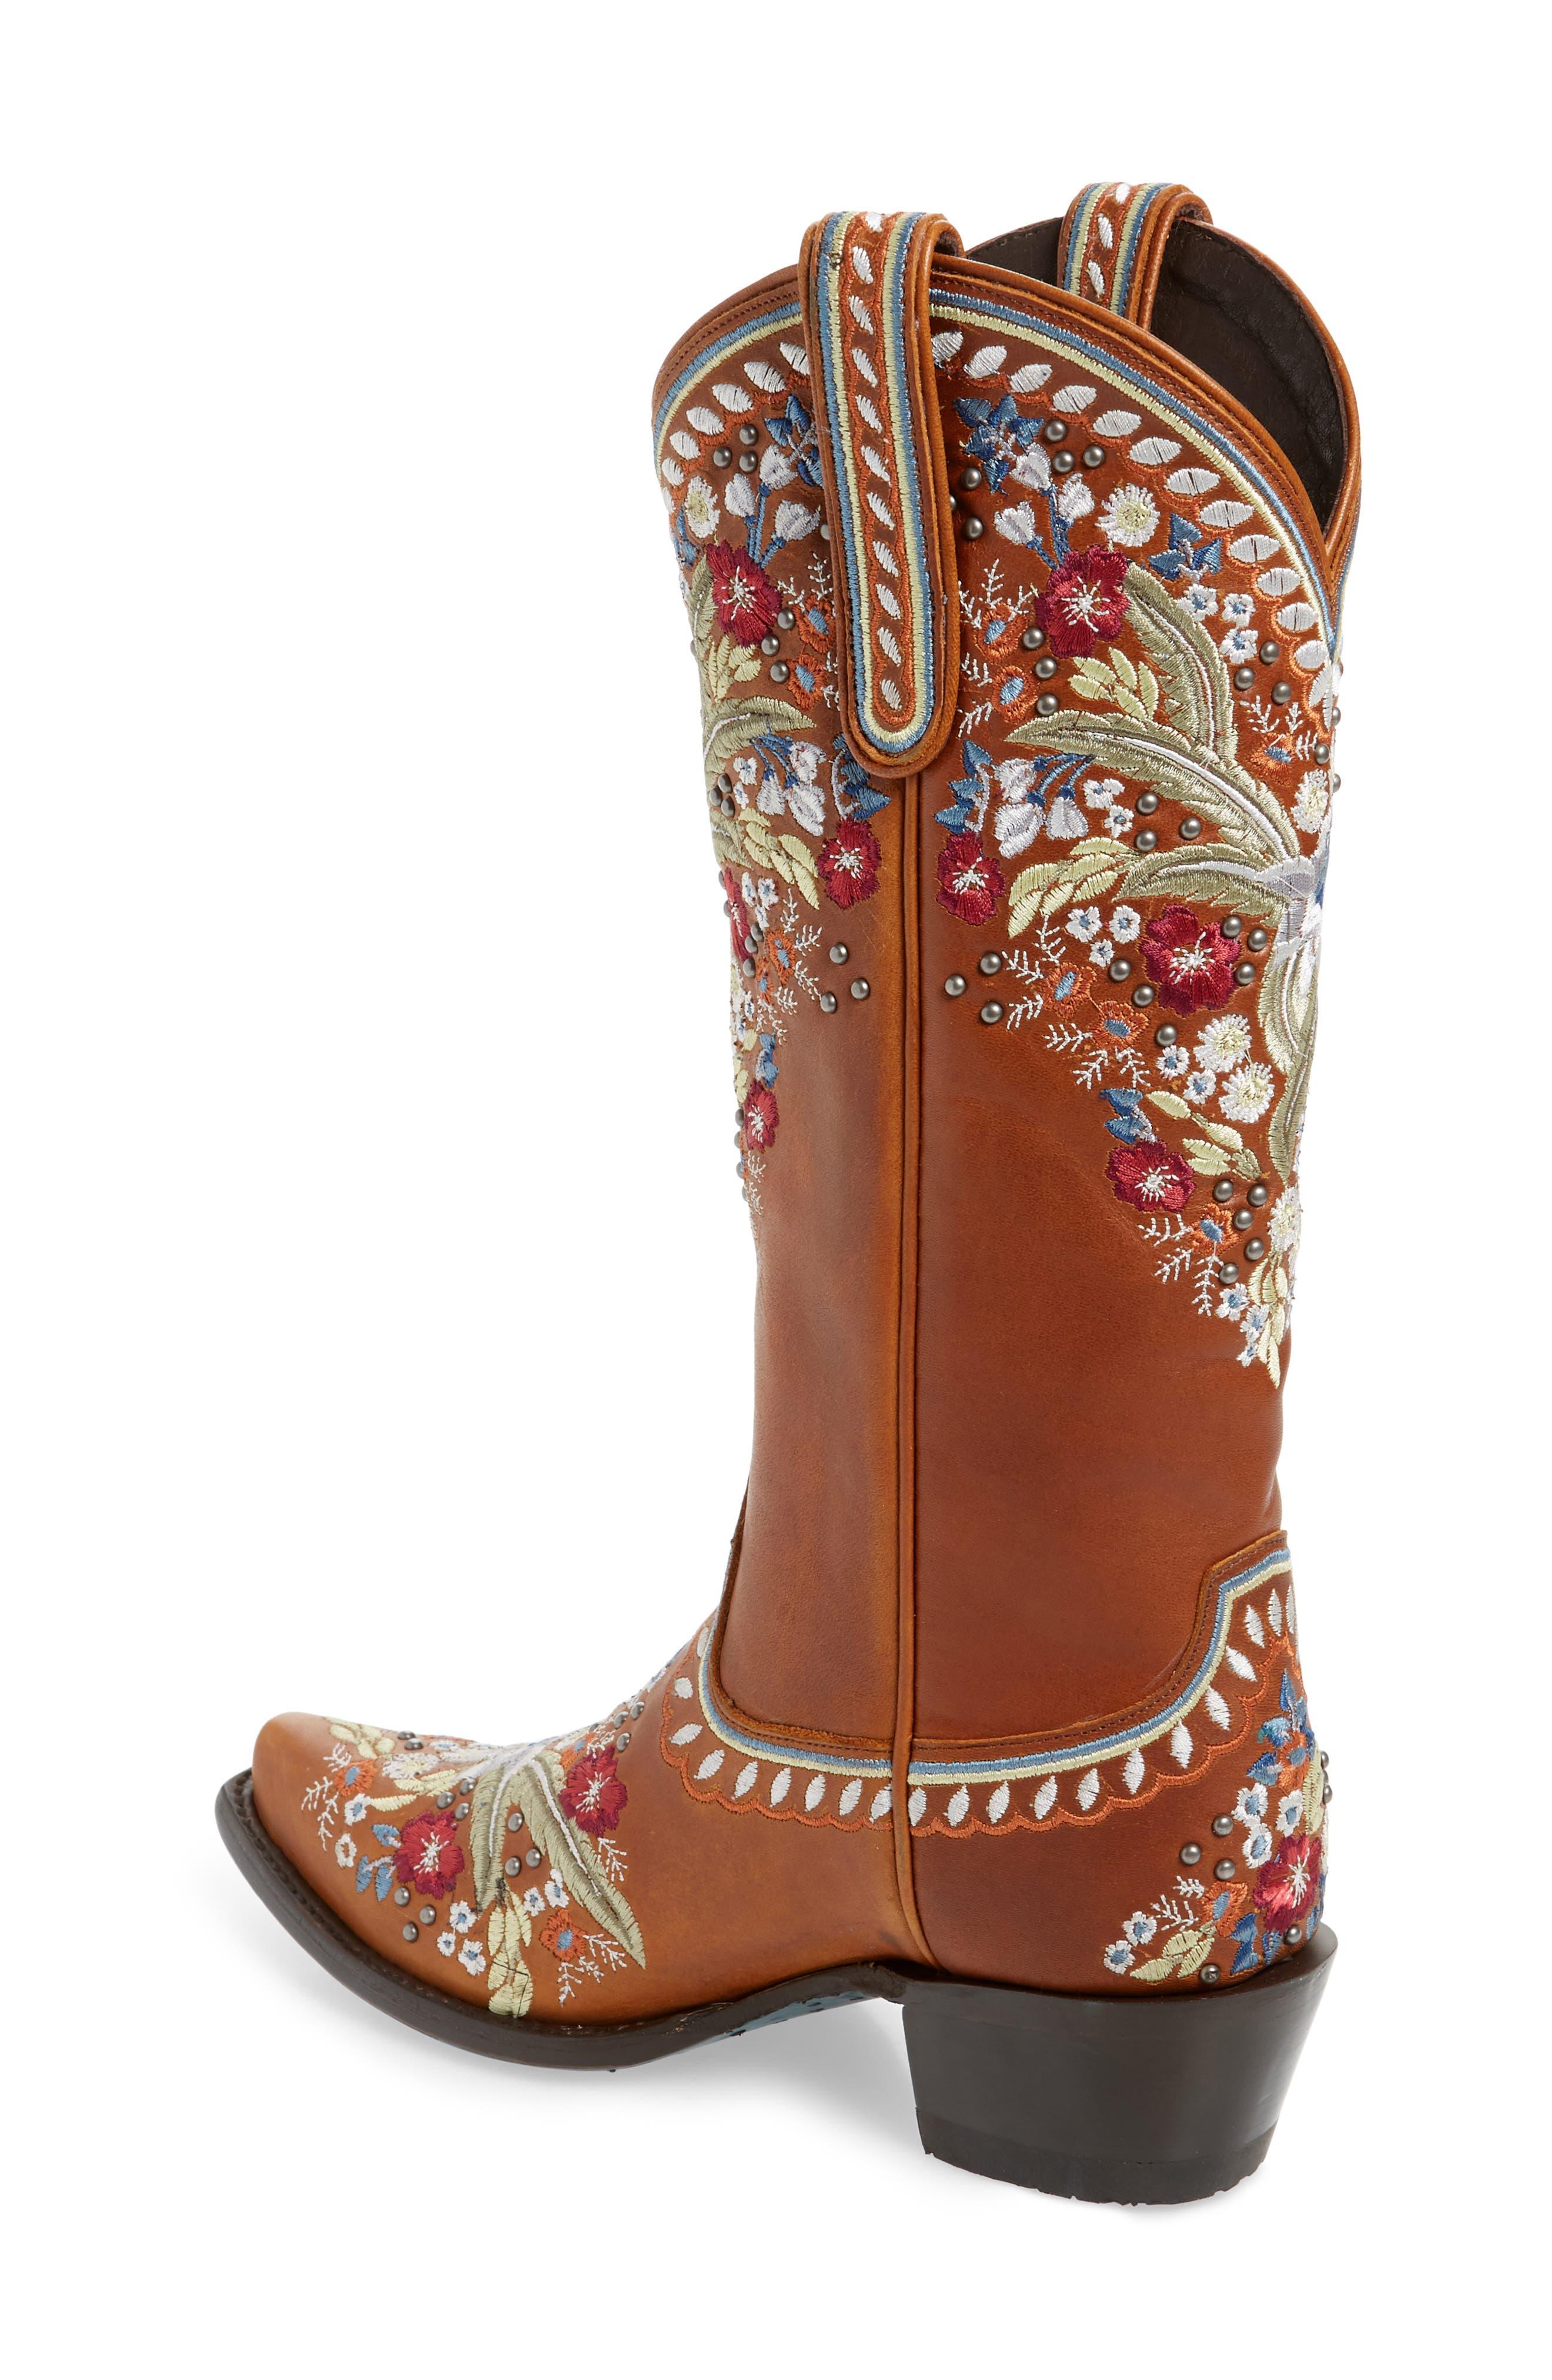 d86235afbe82b Women's Beige Mid-Calf Boots | Nordstrom